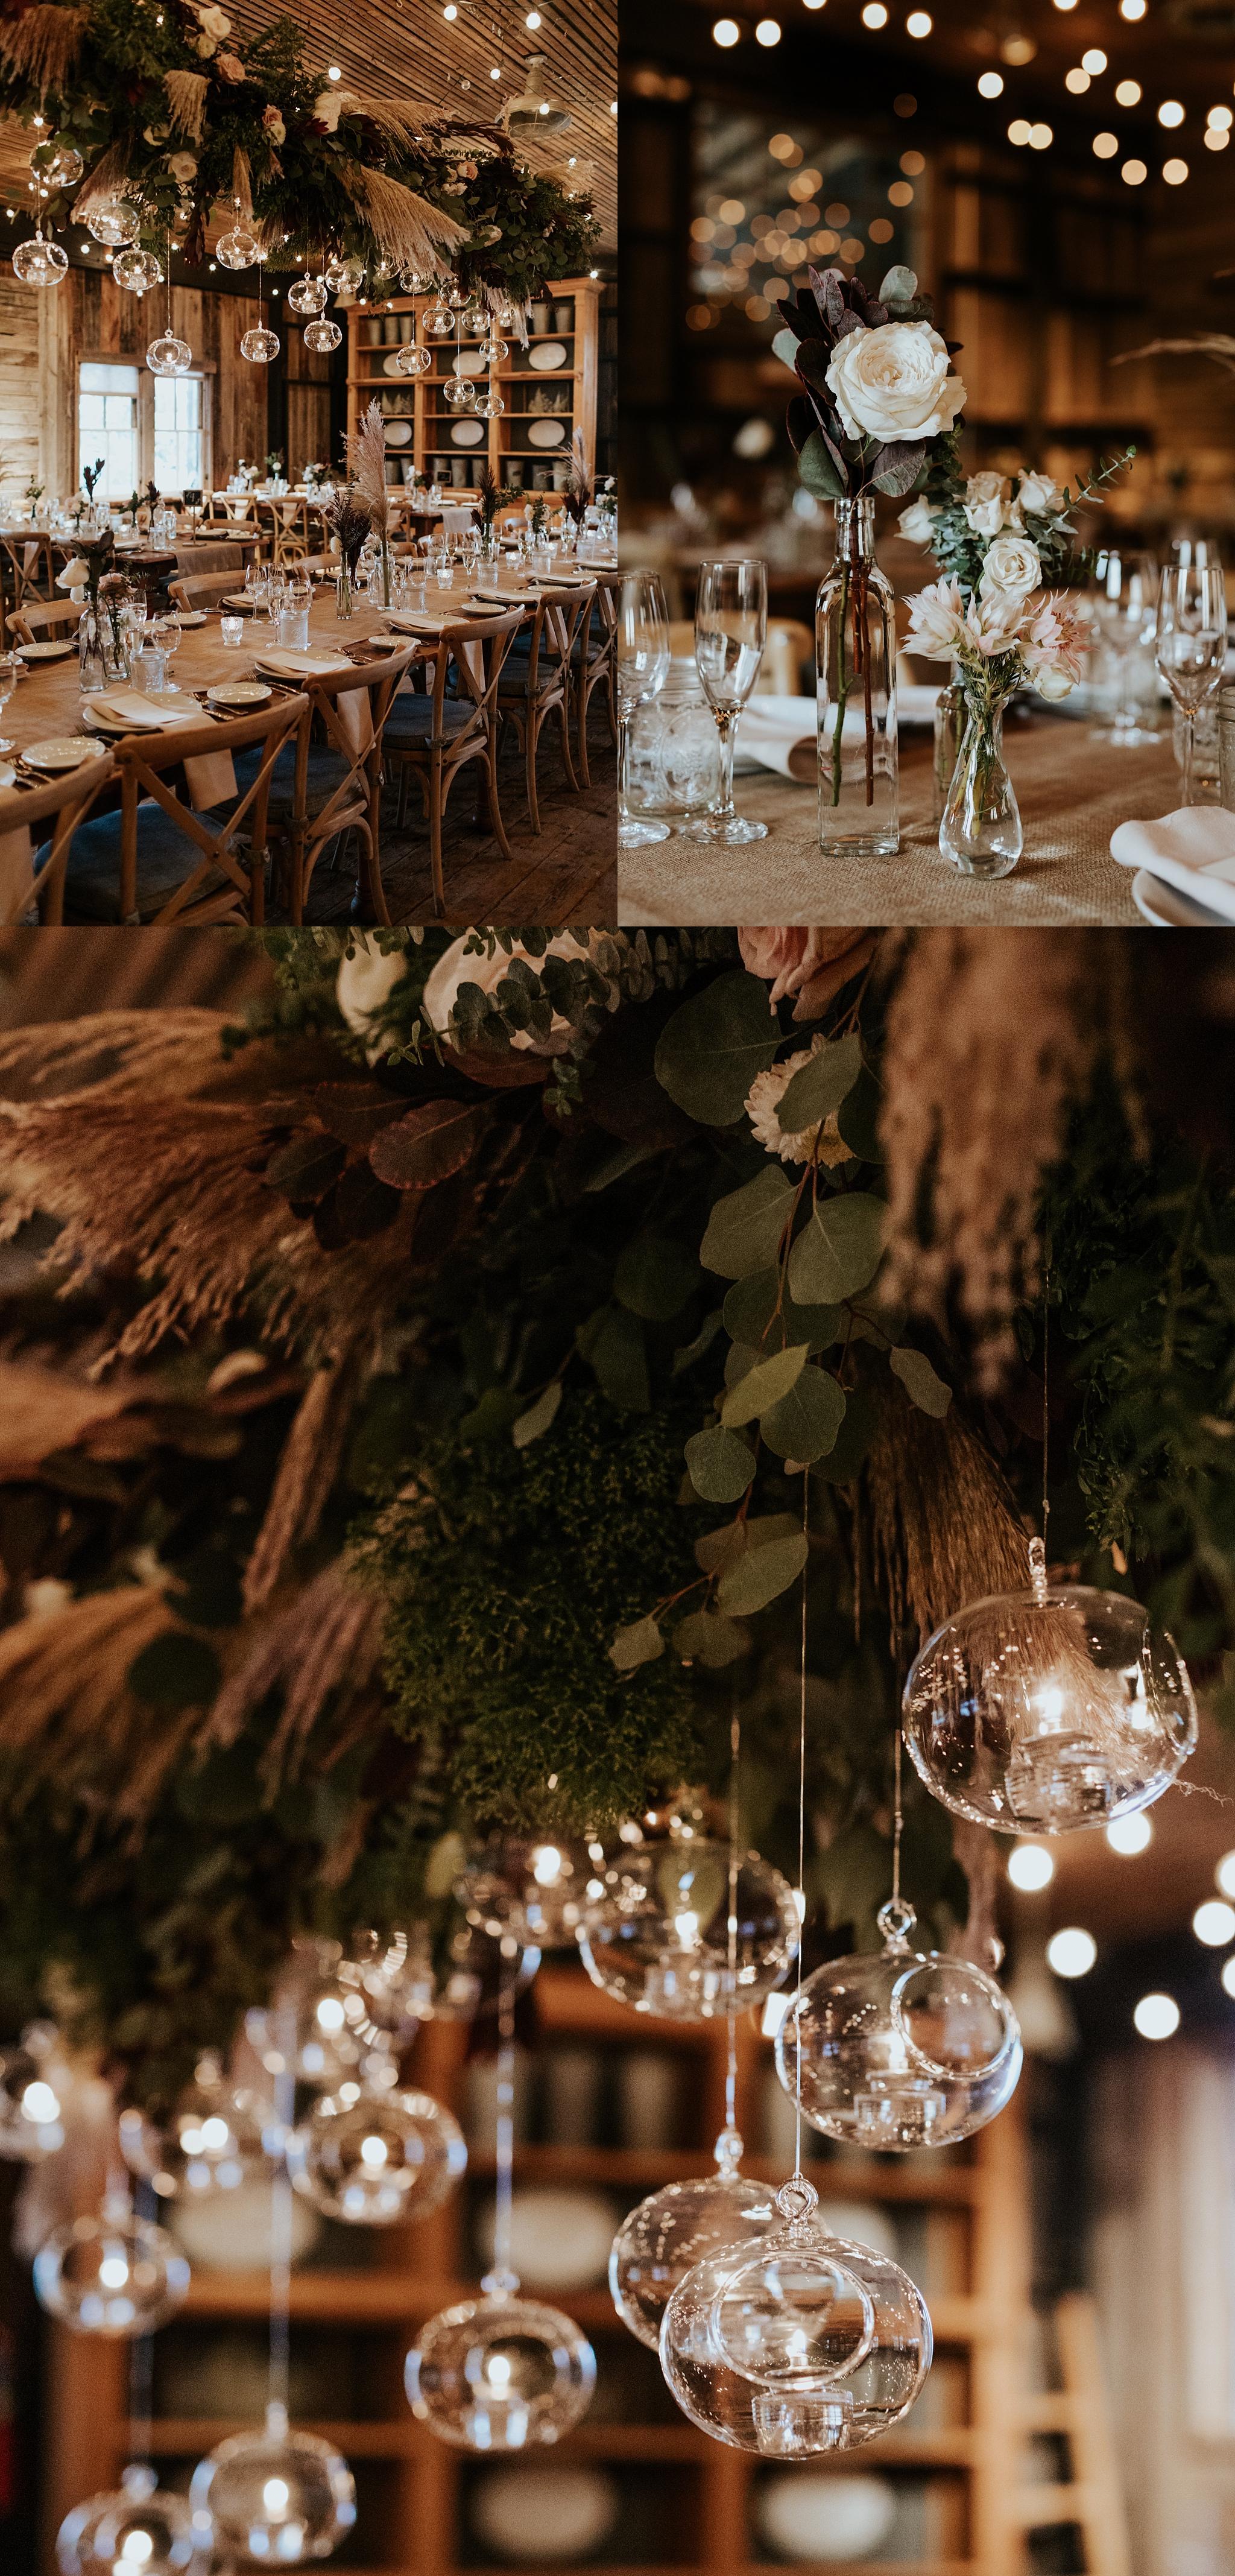 Heartfelt Botanical Terrain at Styers Wedding in Glenn Mills Pennslyvania by Trin Jensen Photography_0046.jpg